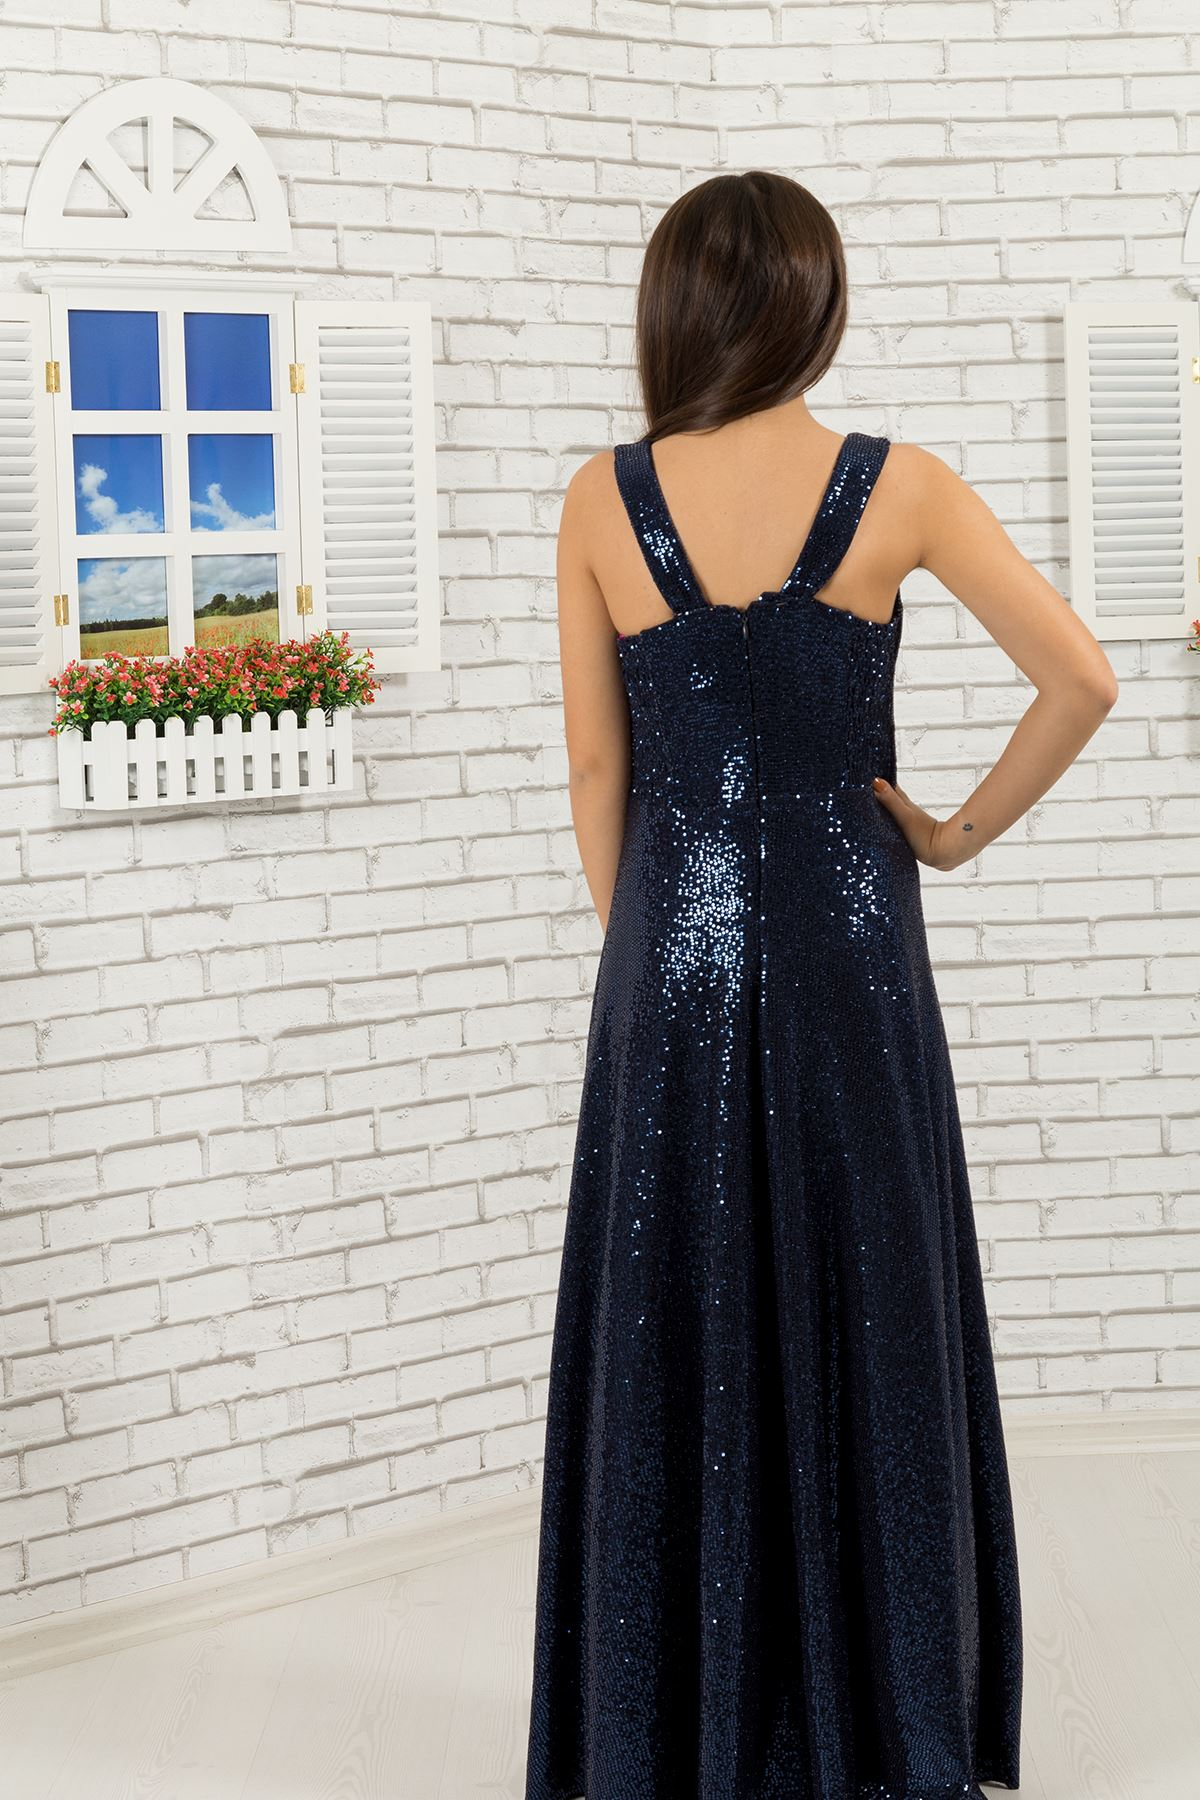 Sequin fabric Girl Evening Dress 477 Navy